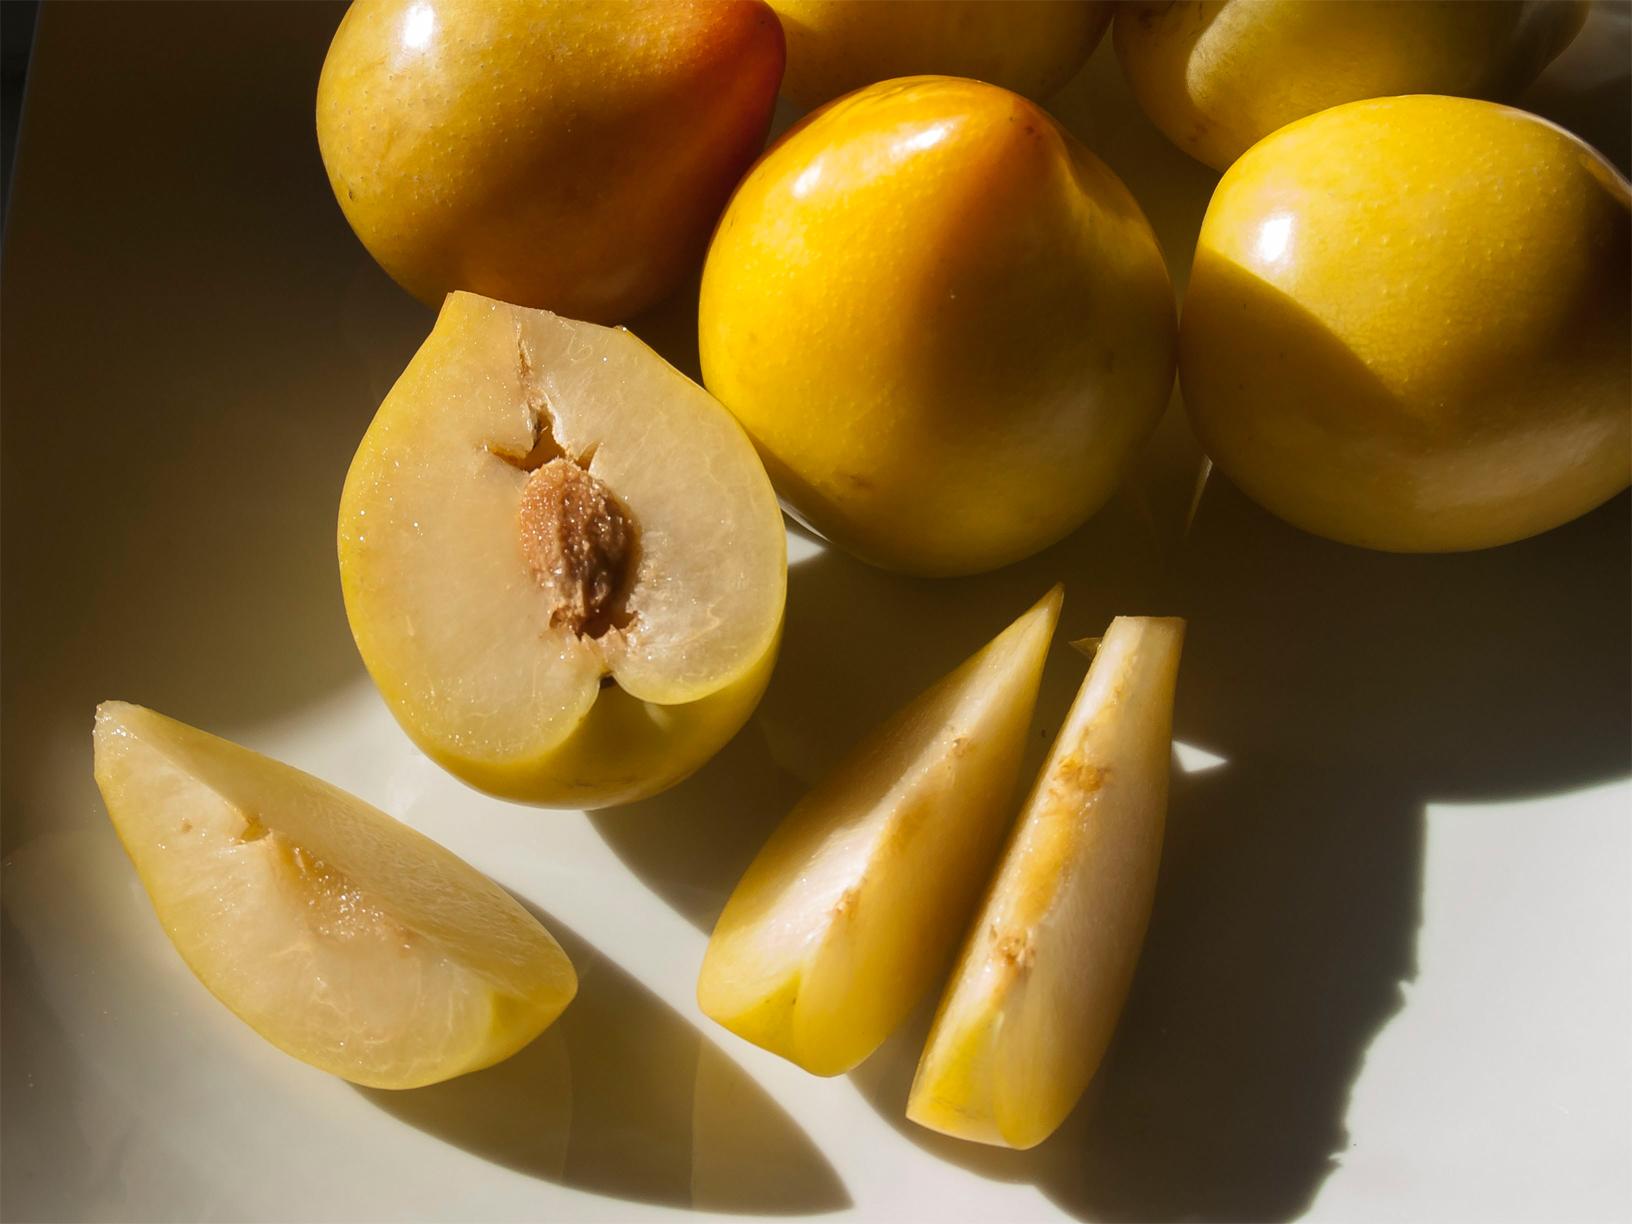 Lemon-plum-flesh-with-seed